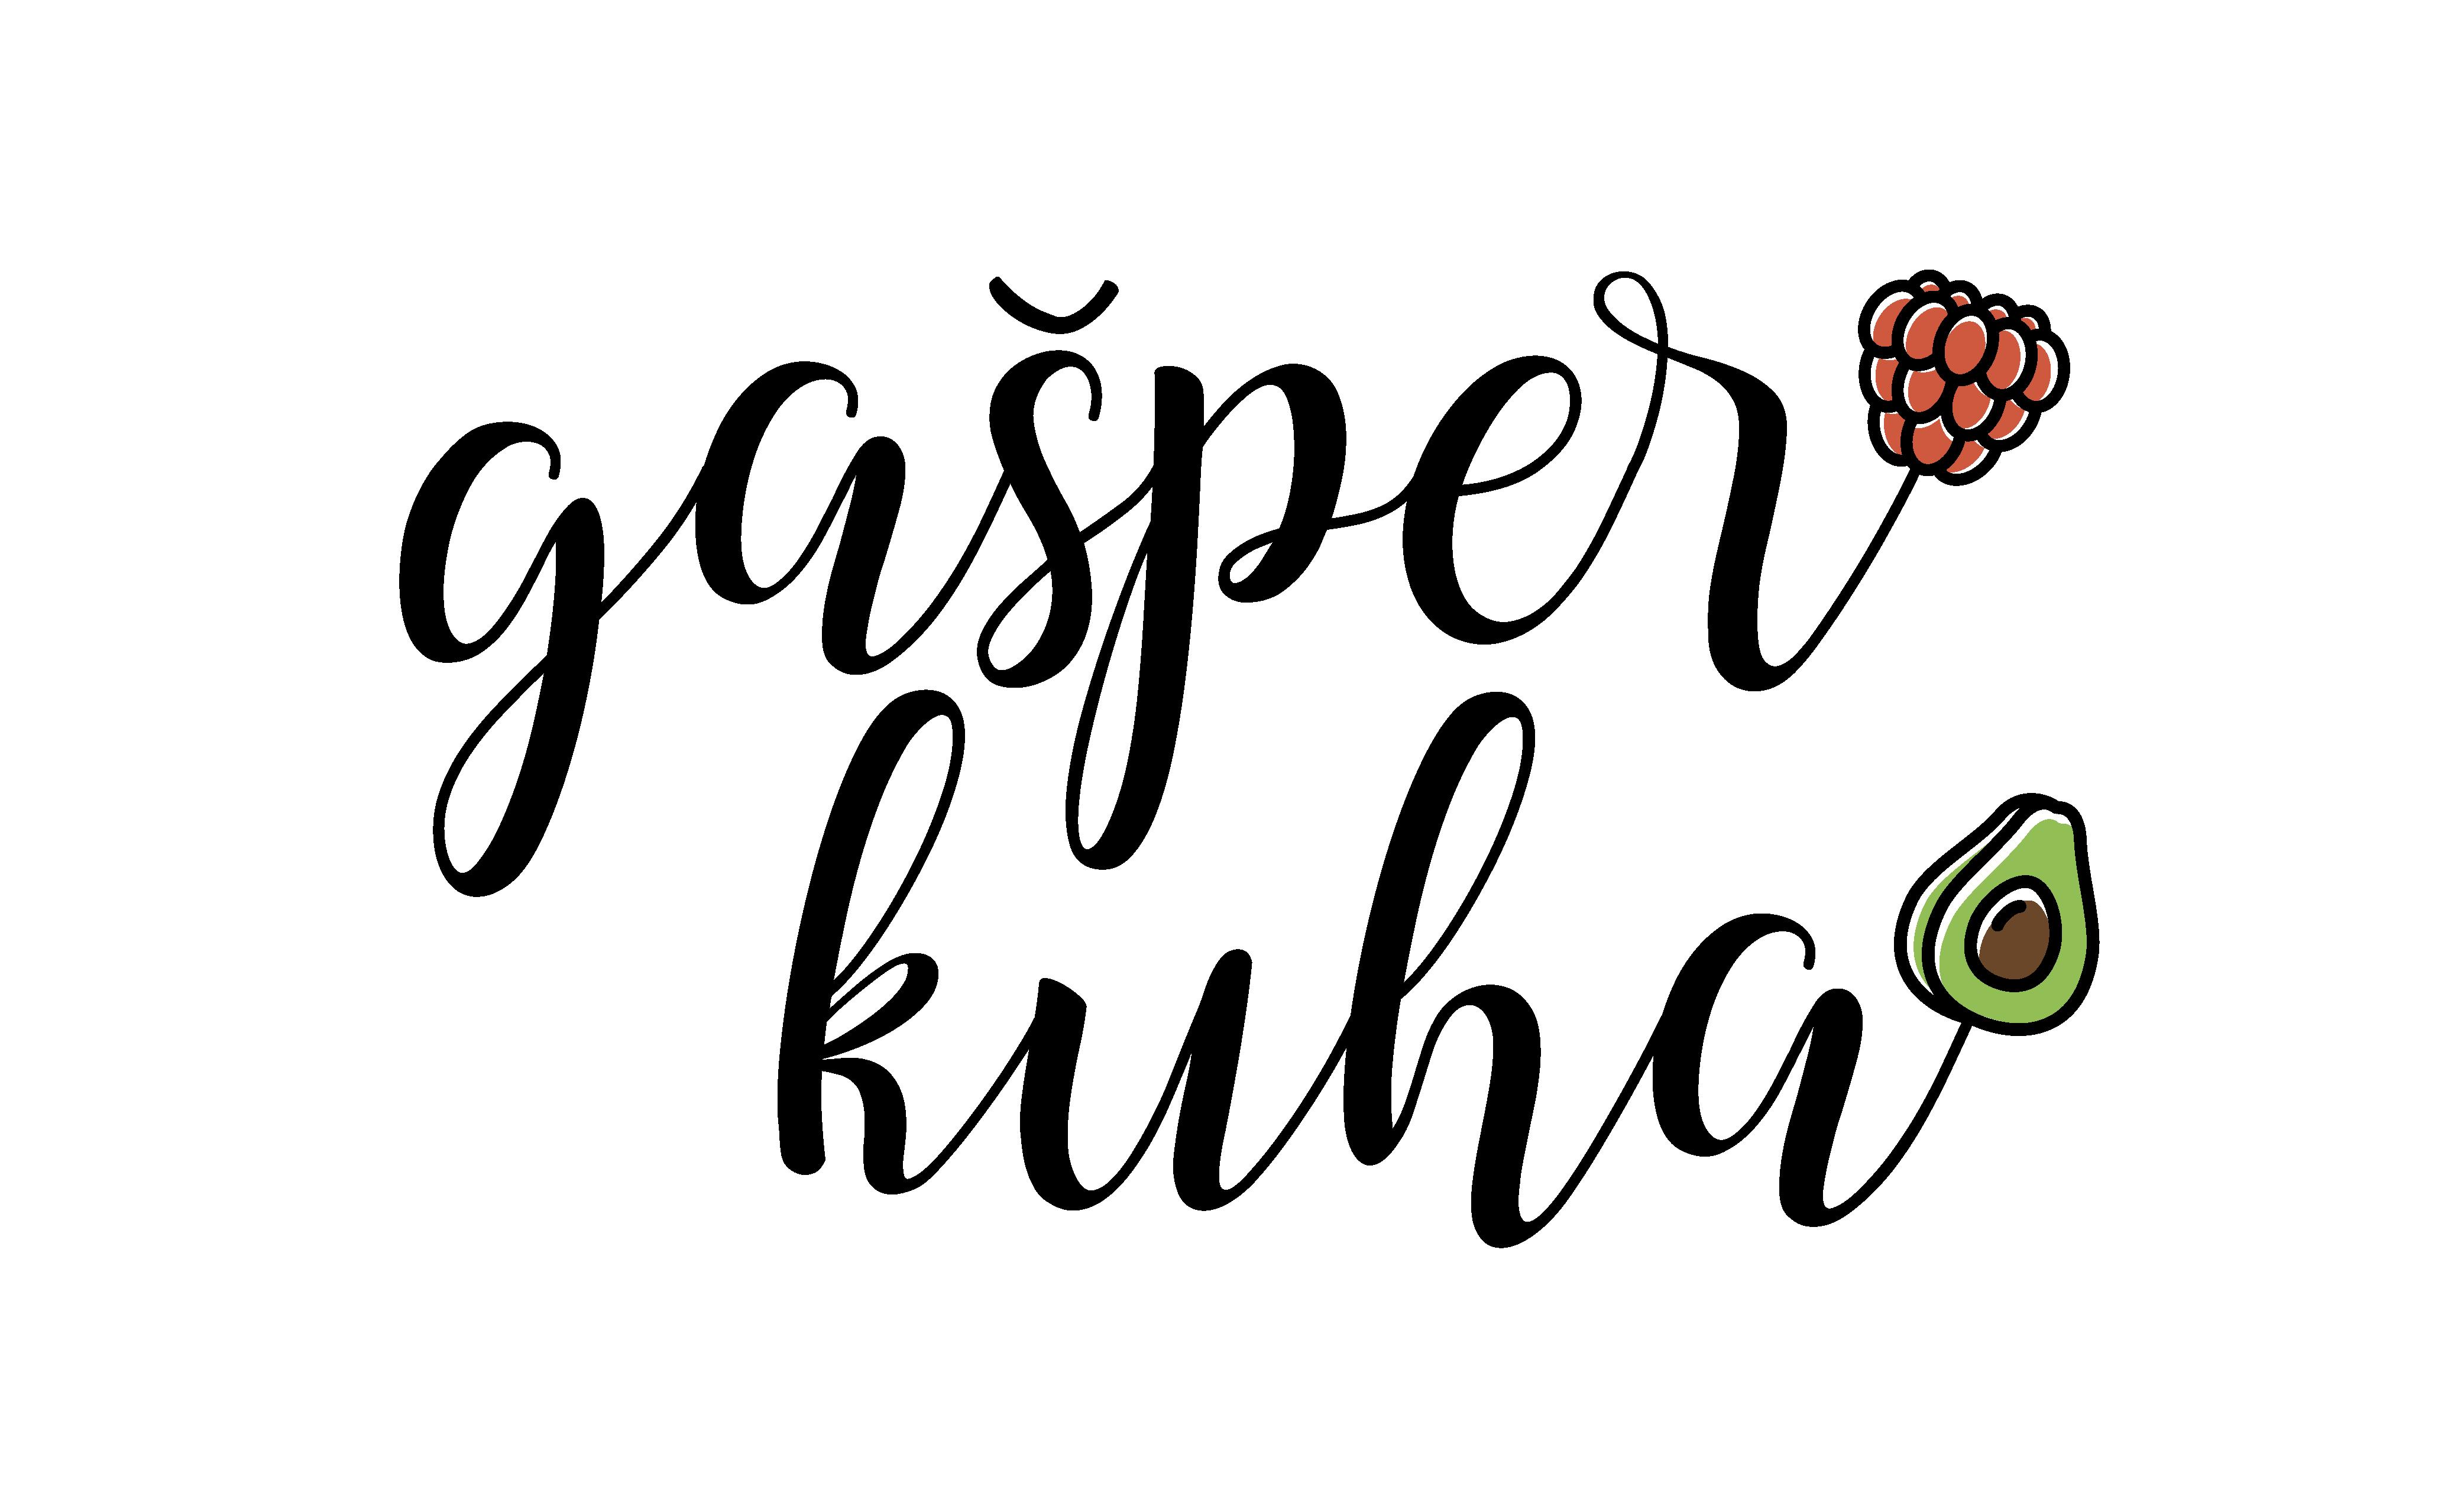 GAŠPER KUHA